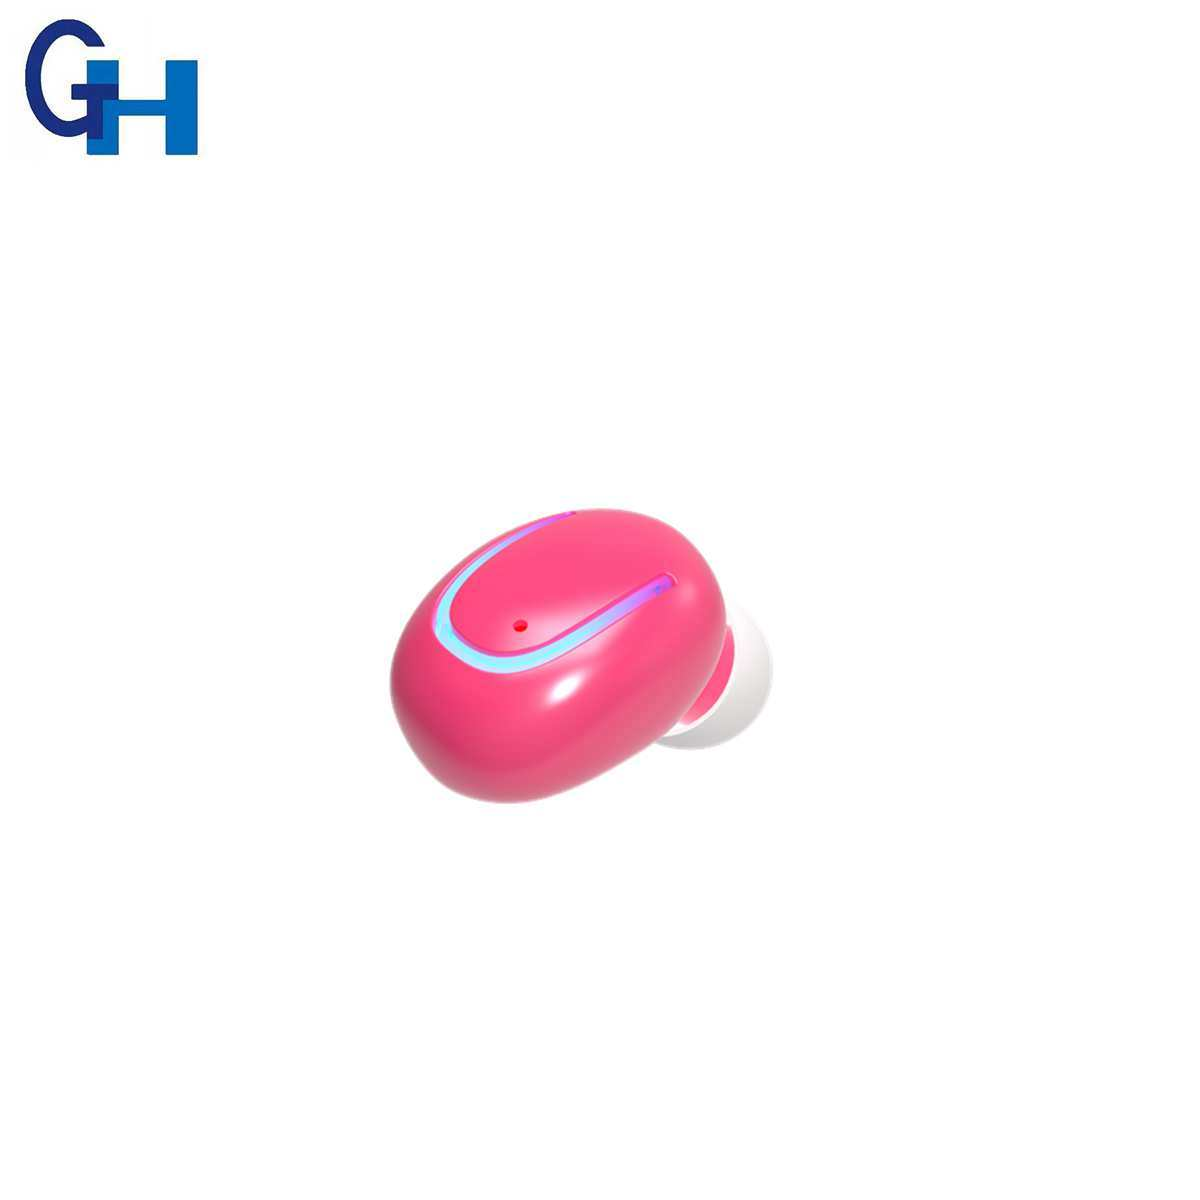 Promotional Super Mini Noise Reduction Small Single Wireless Bluetooth Earphone